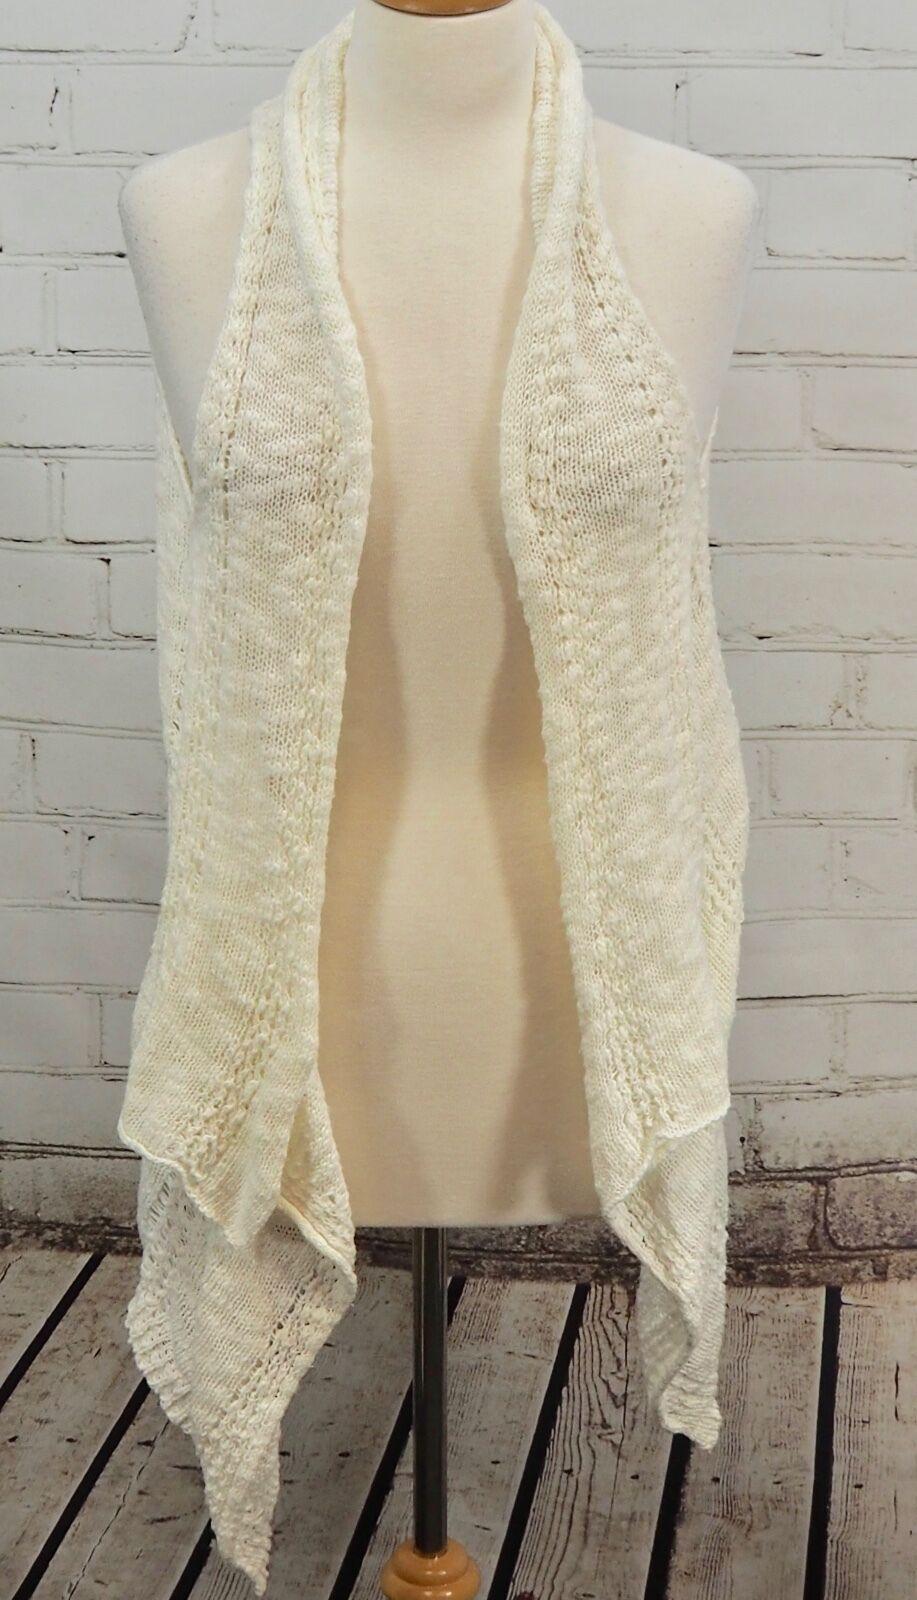 Soma Intimates Lounge Coordinates Crochet Sweater Vest Ivory Open Wrap Cardi S M